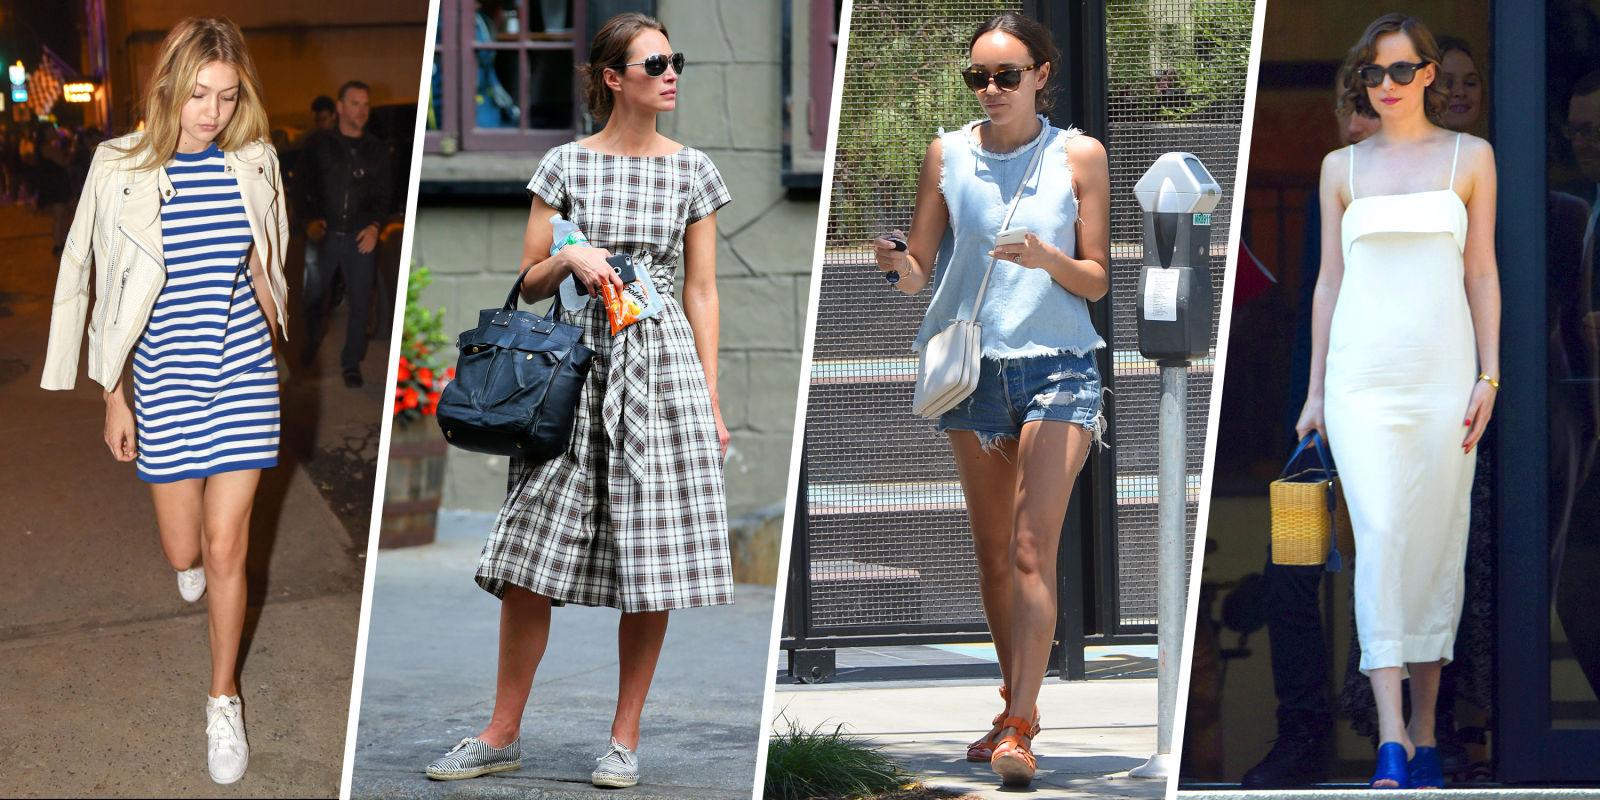 Fashion - Latest 2017 Fashion Trends & News For Women